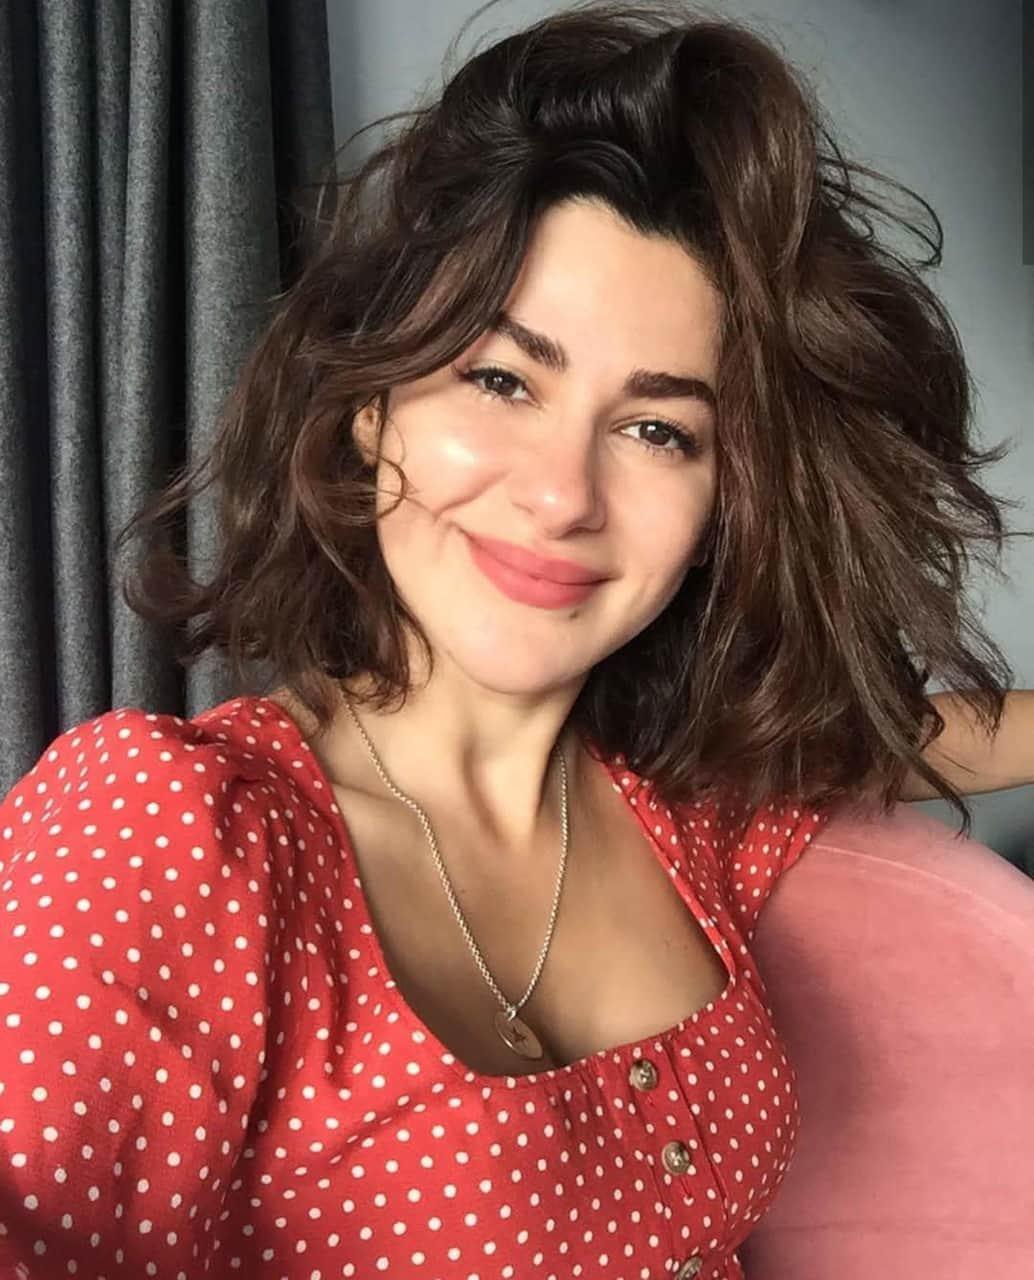 Tatyana Lomachenko - Hire at Ithire